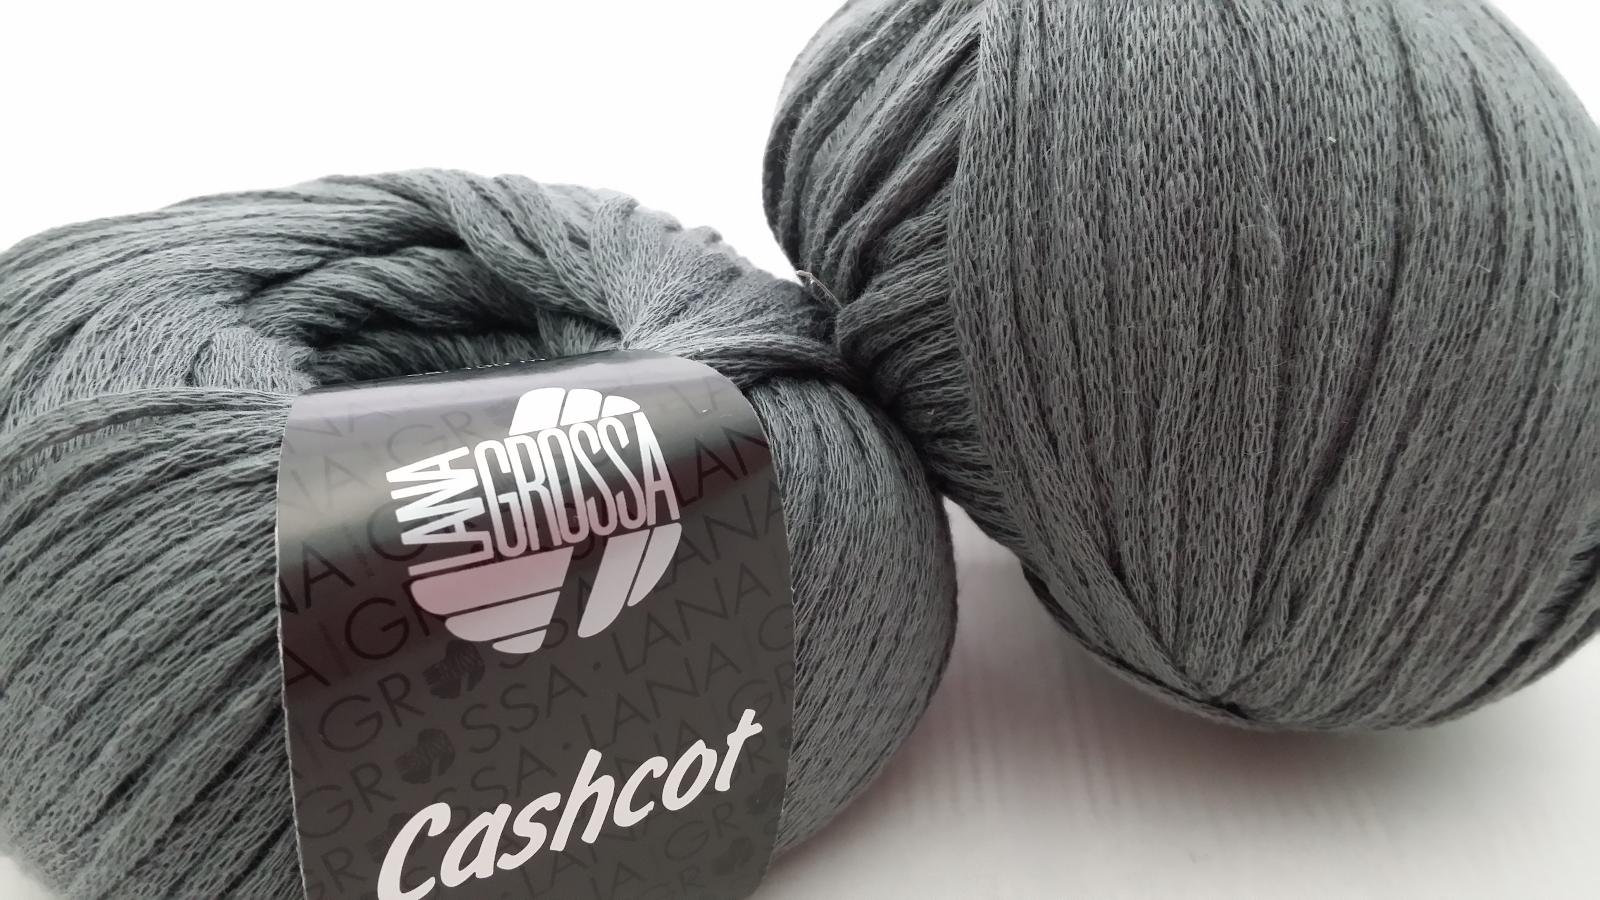 700 700 700 g Cashcot Lana Grossa FB 14 gris 85% coton/15% cachemire 5b6fa2